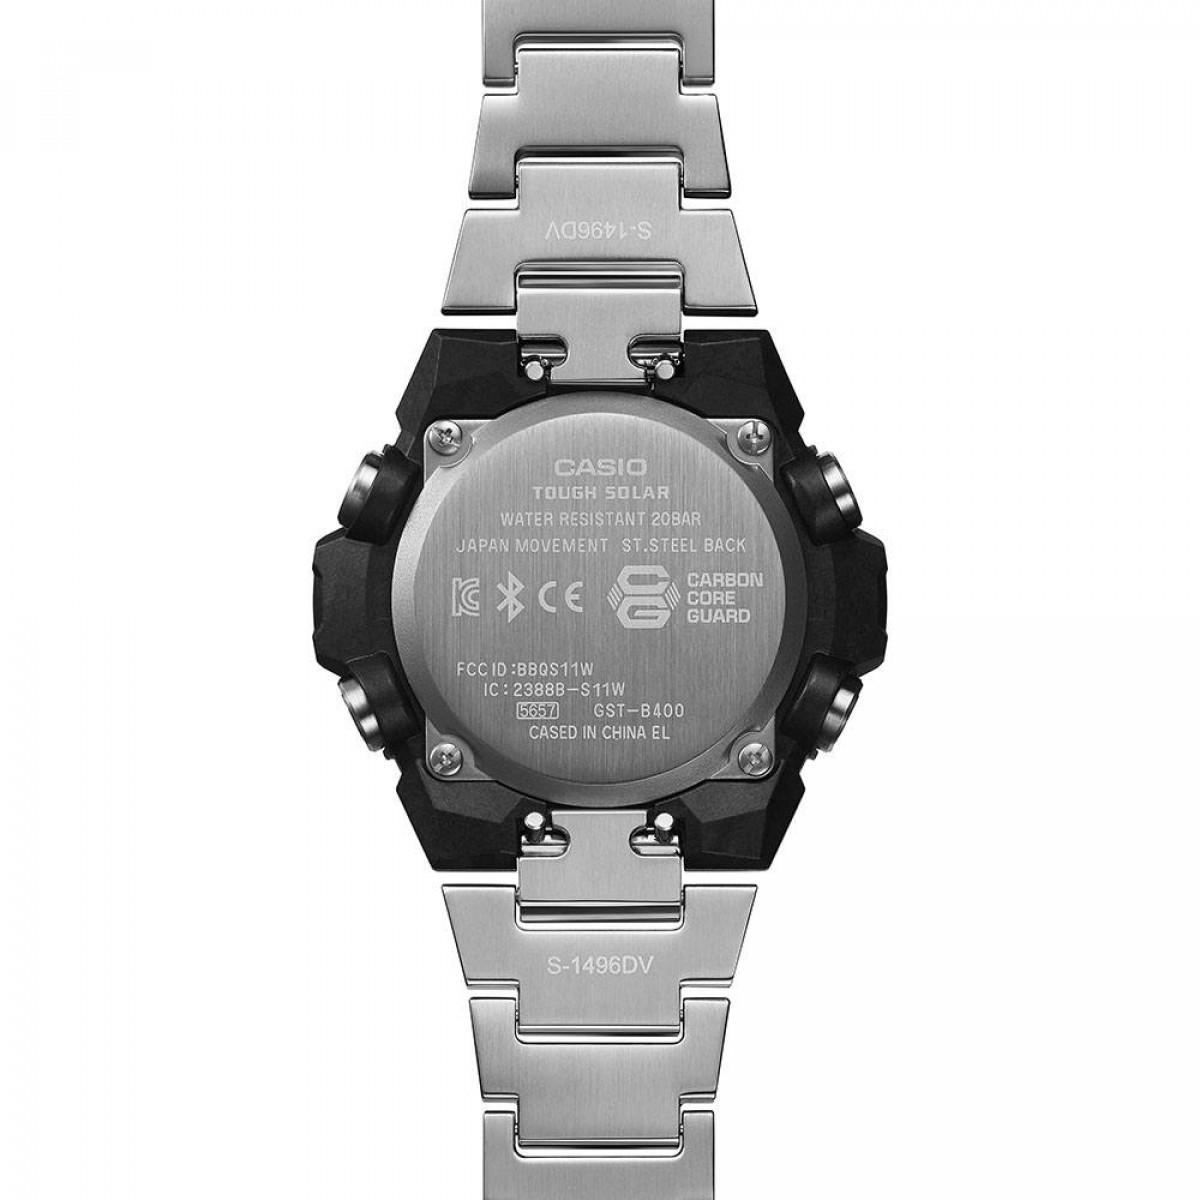 Часовник Casio G-Shock G-Steel GST-B400-1AER